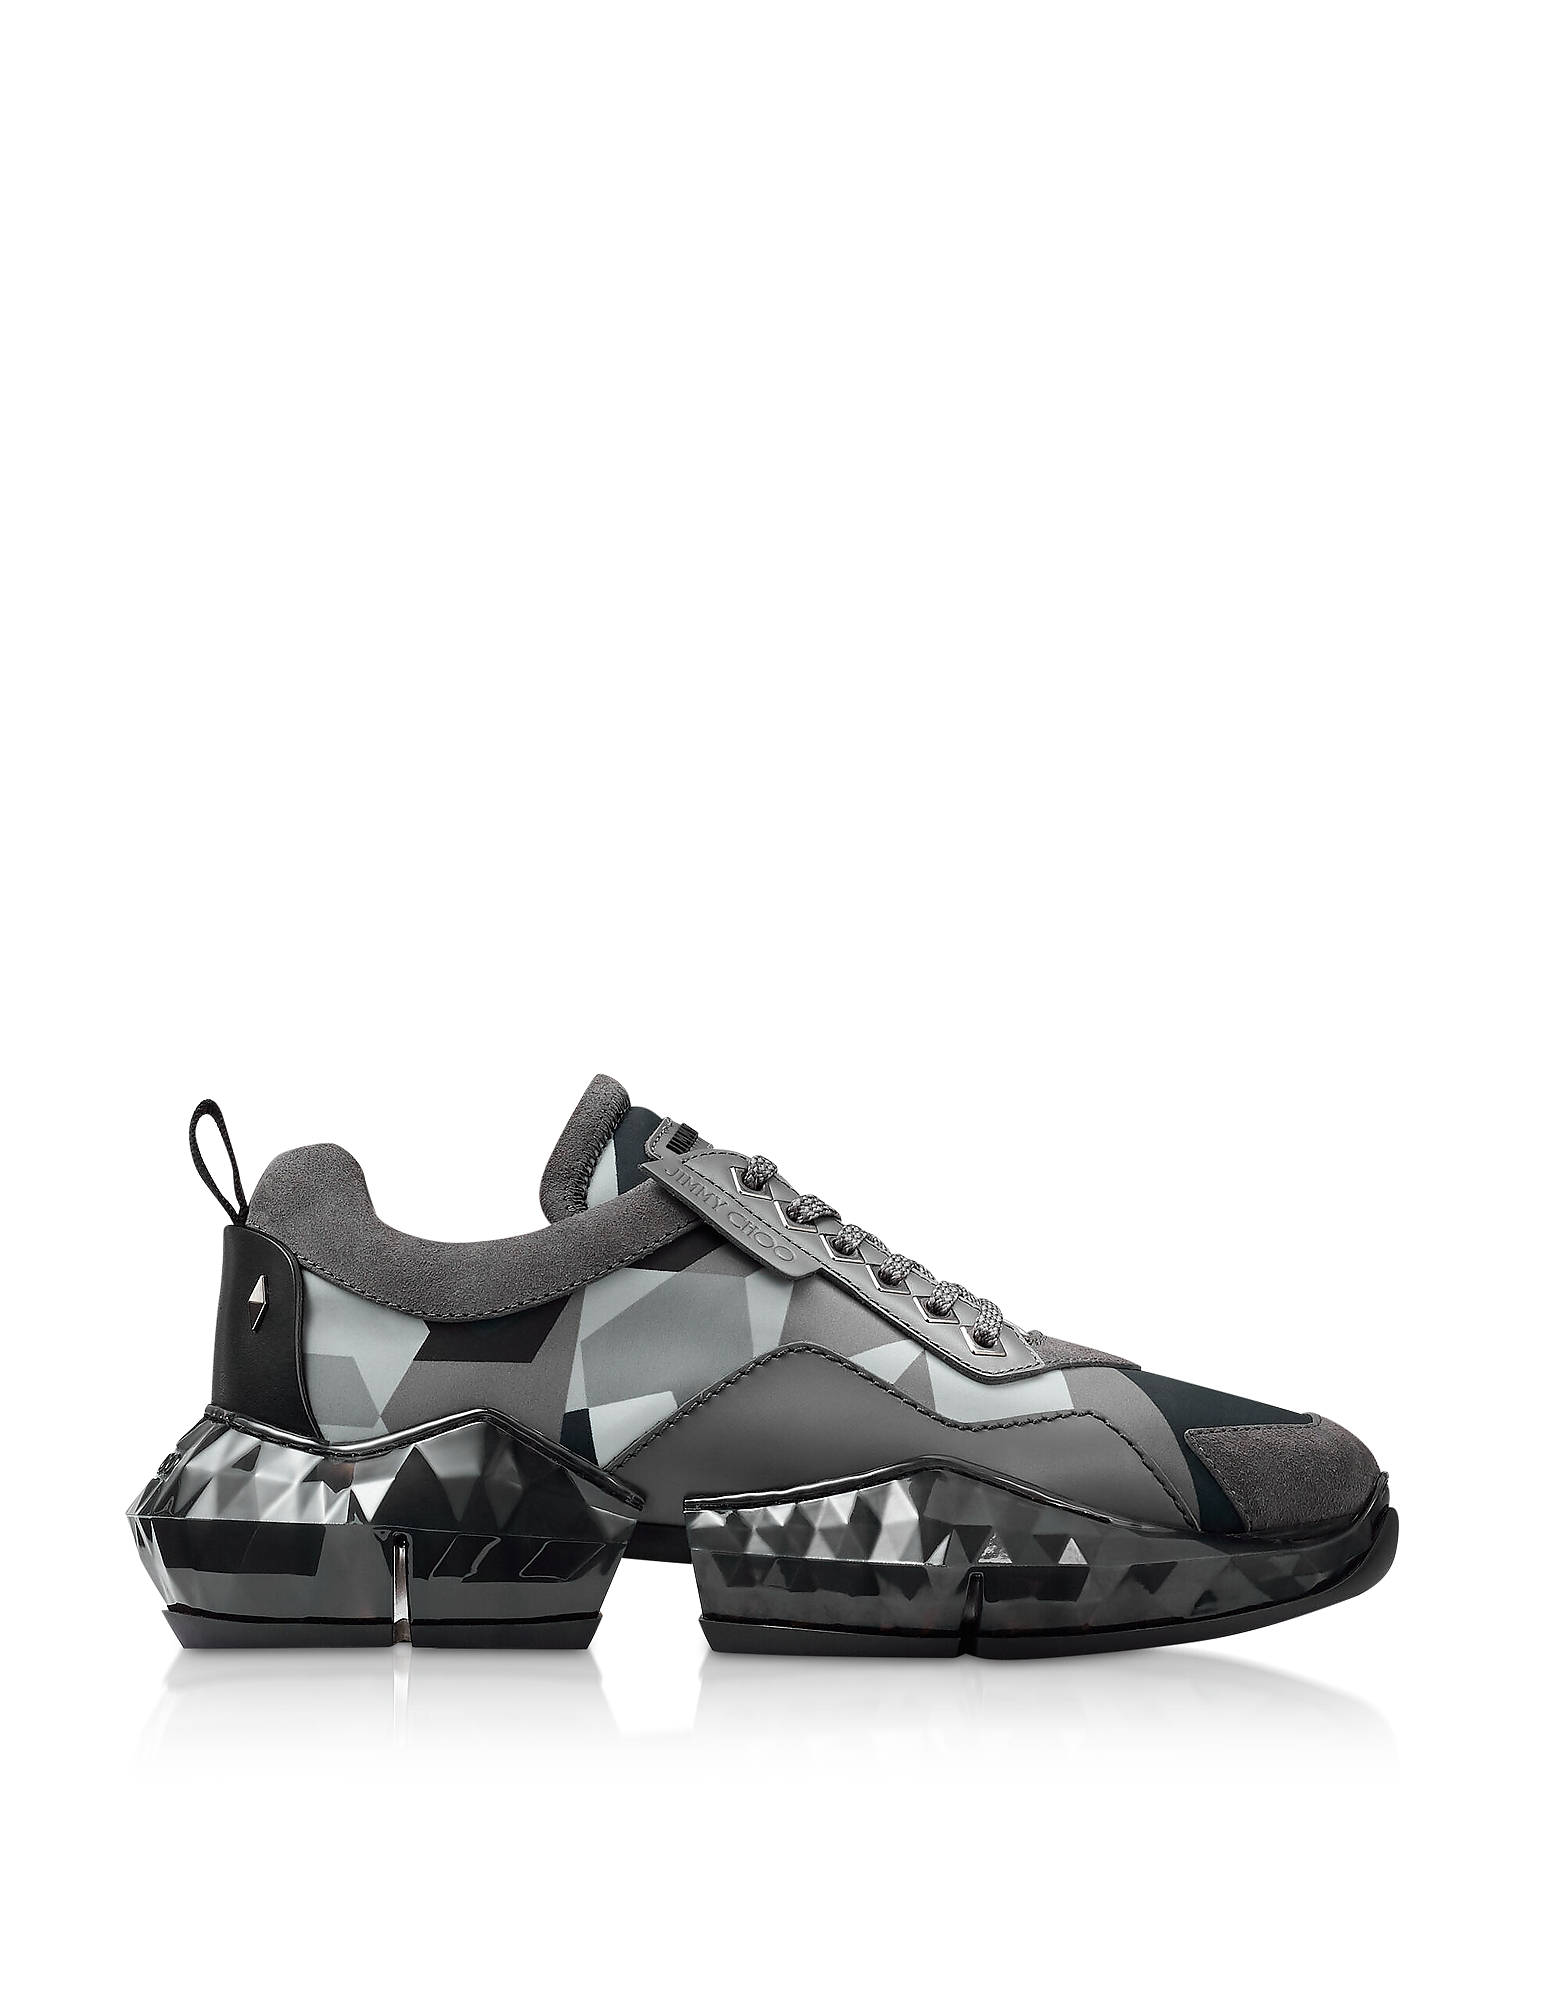 Anthracite Diamond Sneakers w/ Camo Print Nylon